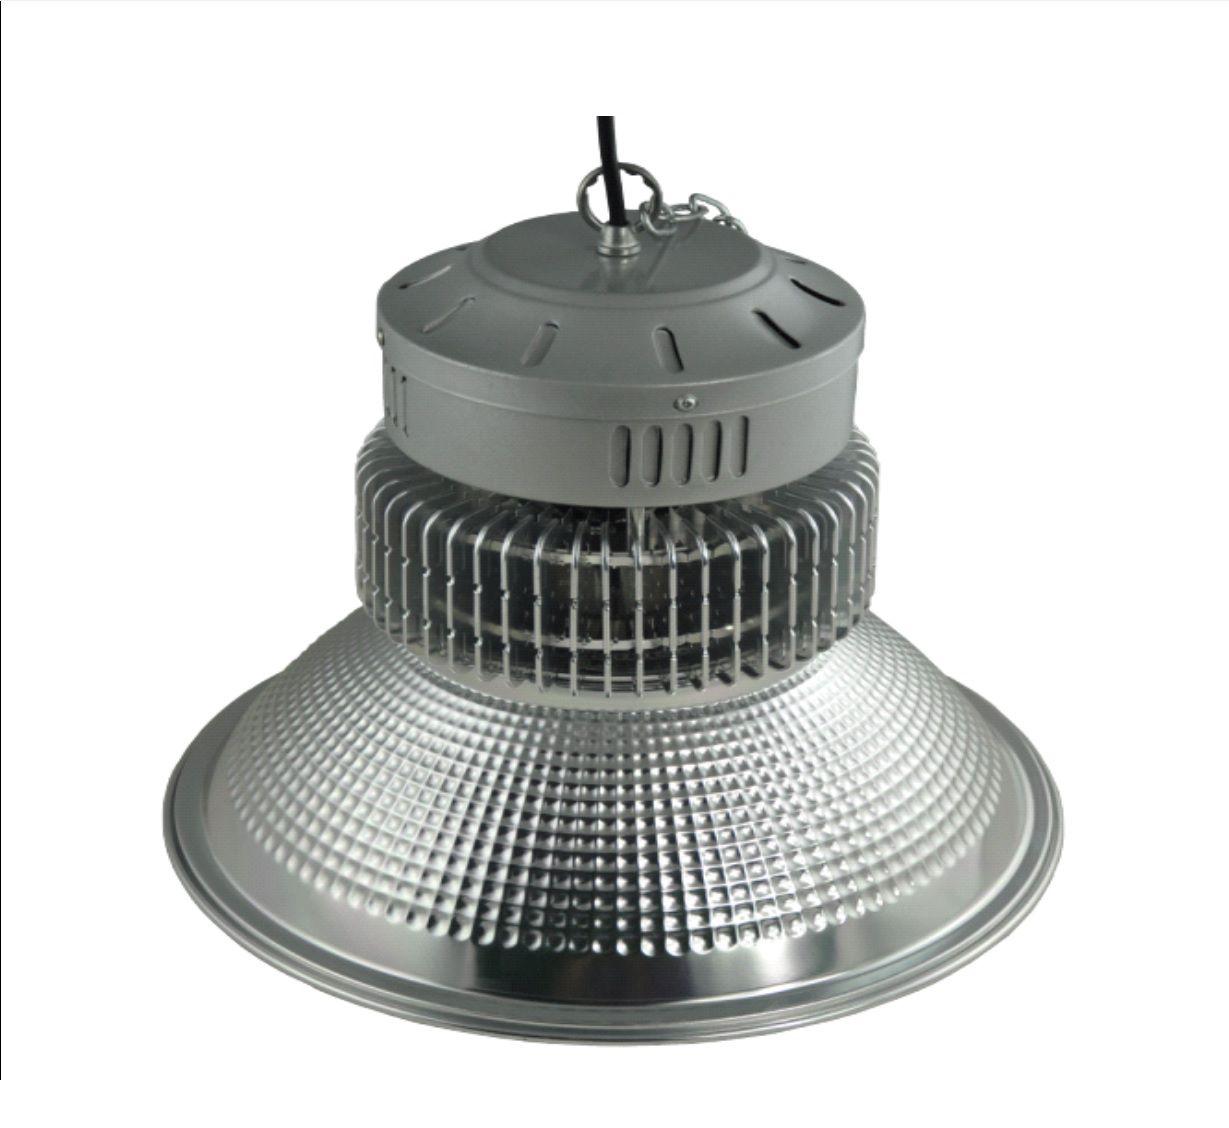 Luminária Industrial High Bay 100W SMD BIVOLT - BRANCO FRIO 6500K